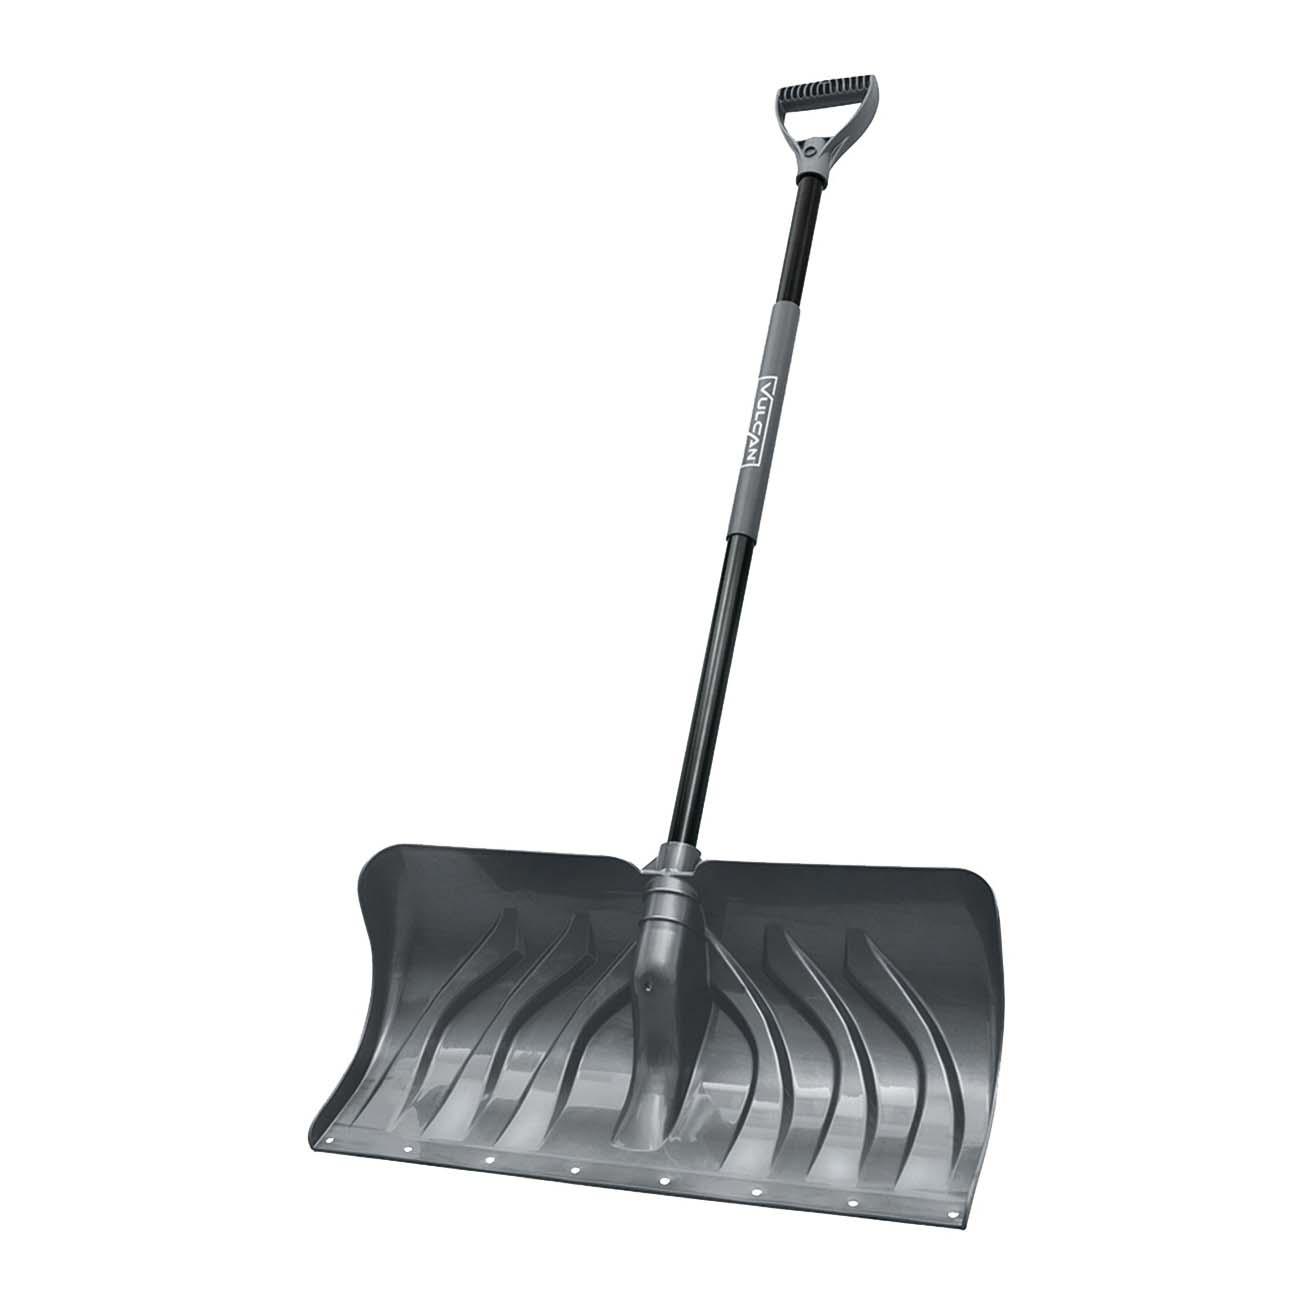 Picture of Vulcan 34632 Snow Shovel, Steel Handle